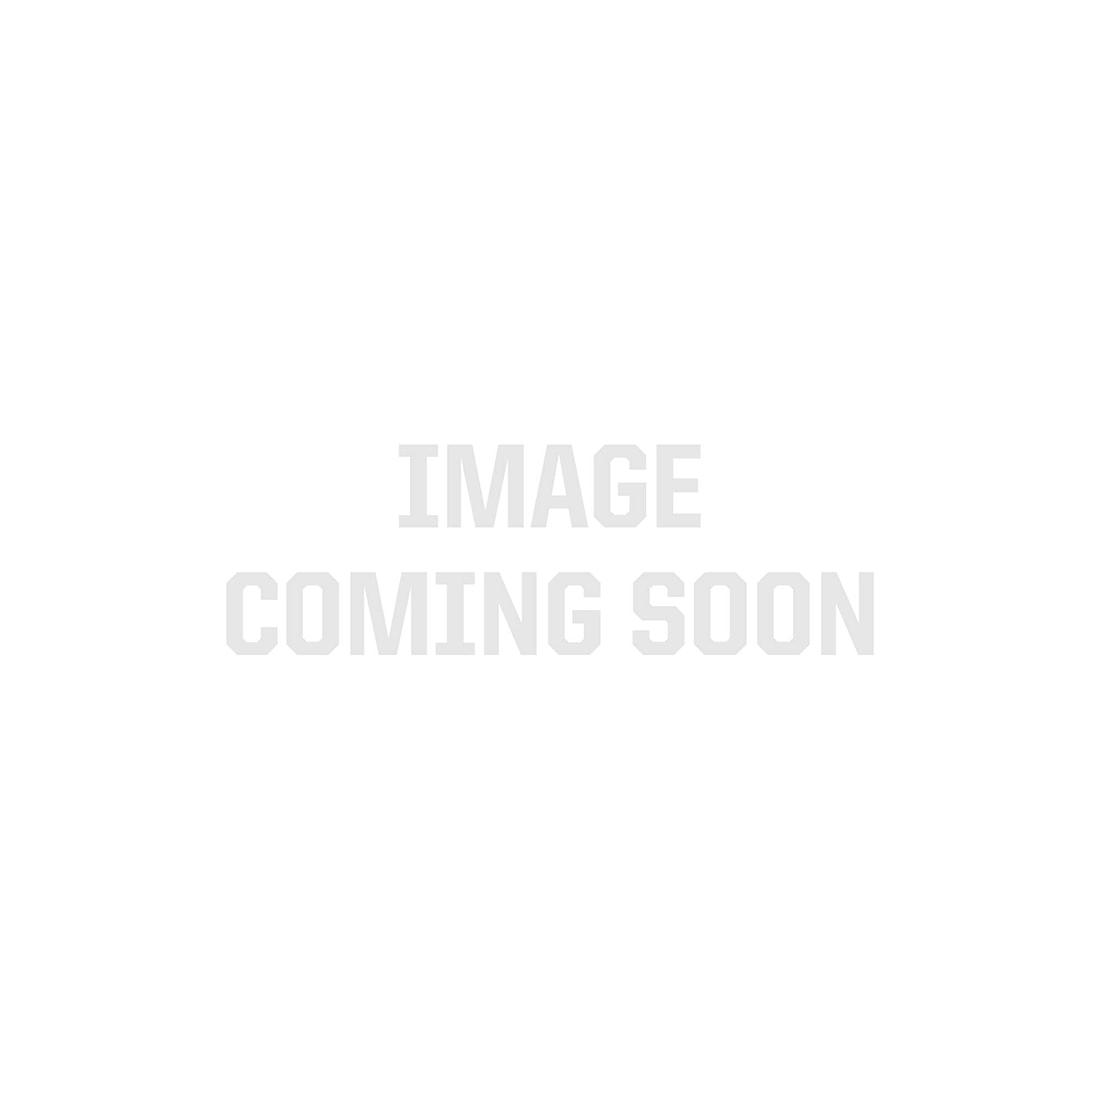 HyperFlex 2835 LED Strip Light - Green - 60/m - CurrentControl - Sample Kit